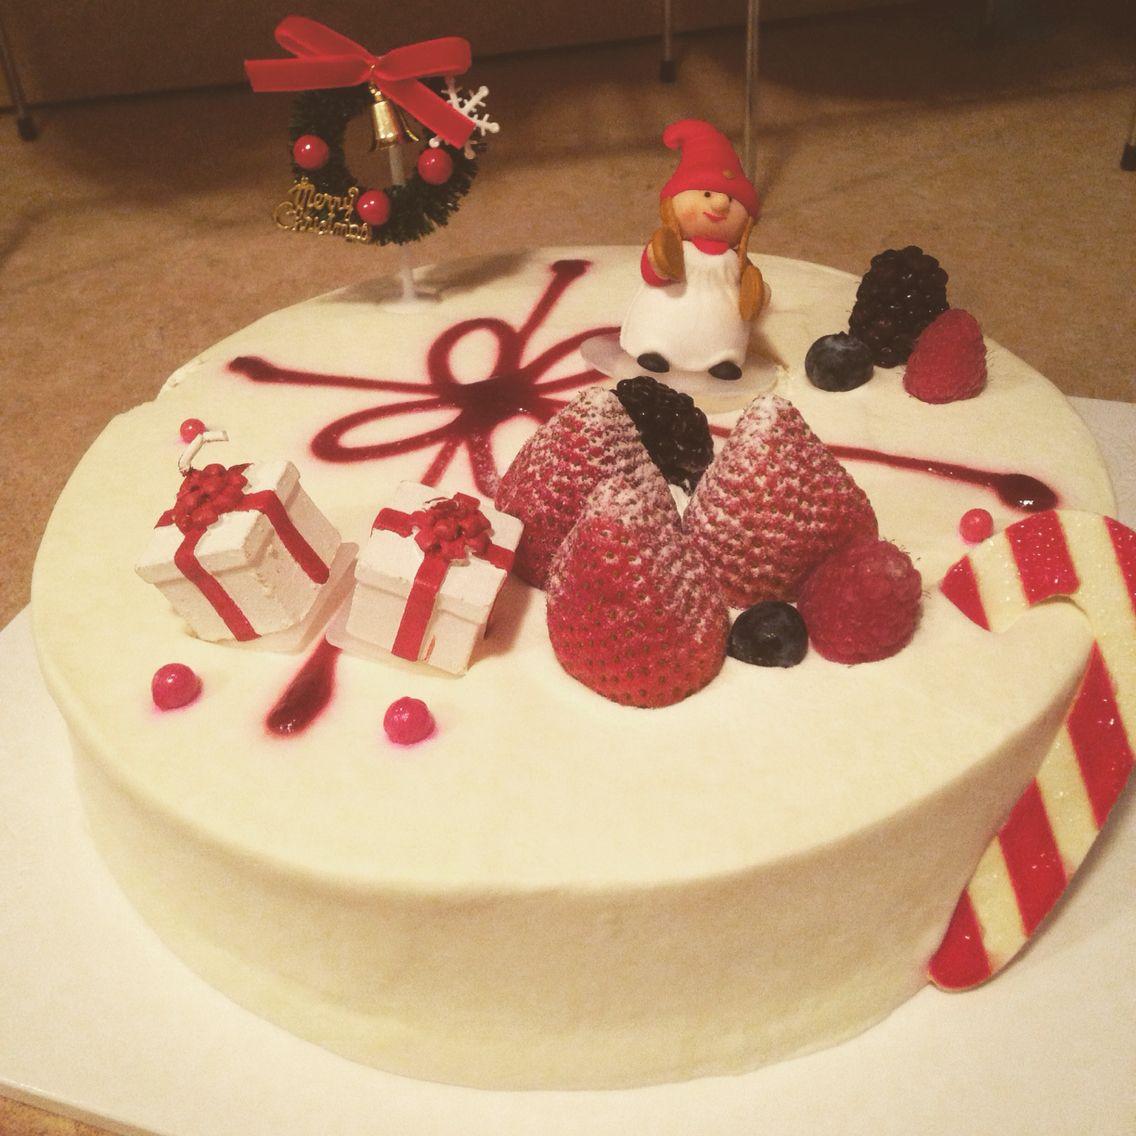 Fresh Cream And Strawberry Cake Paris Baguette